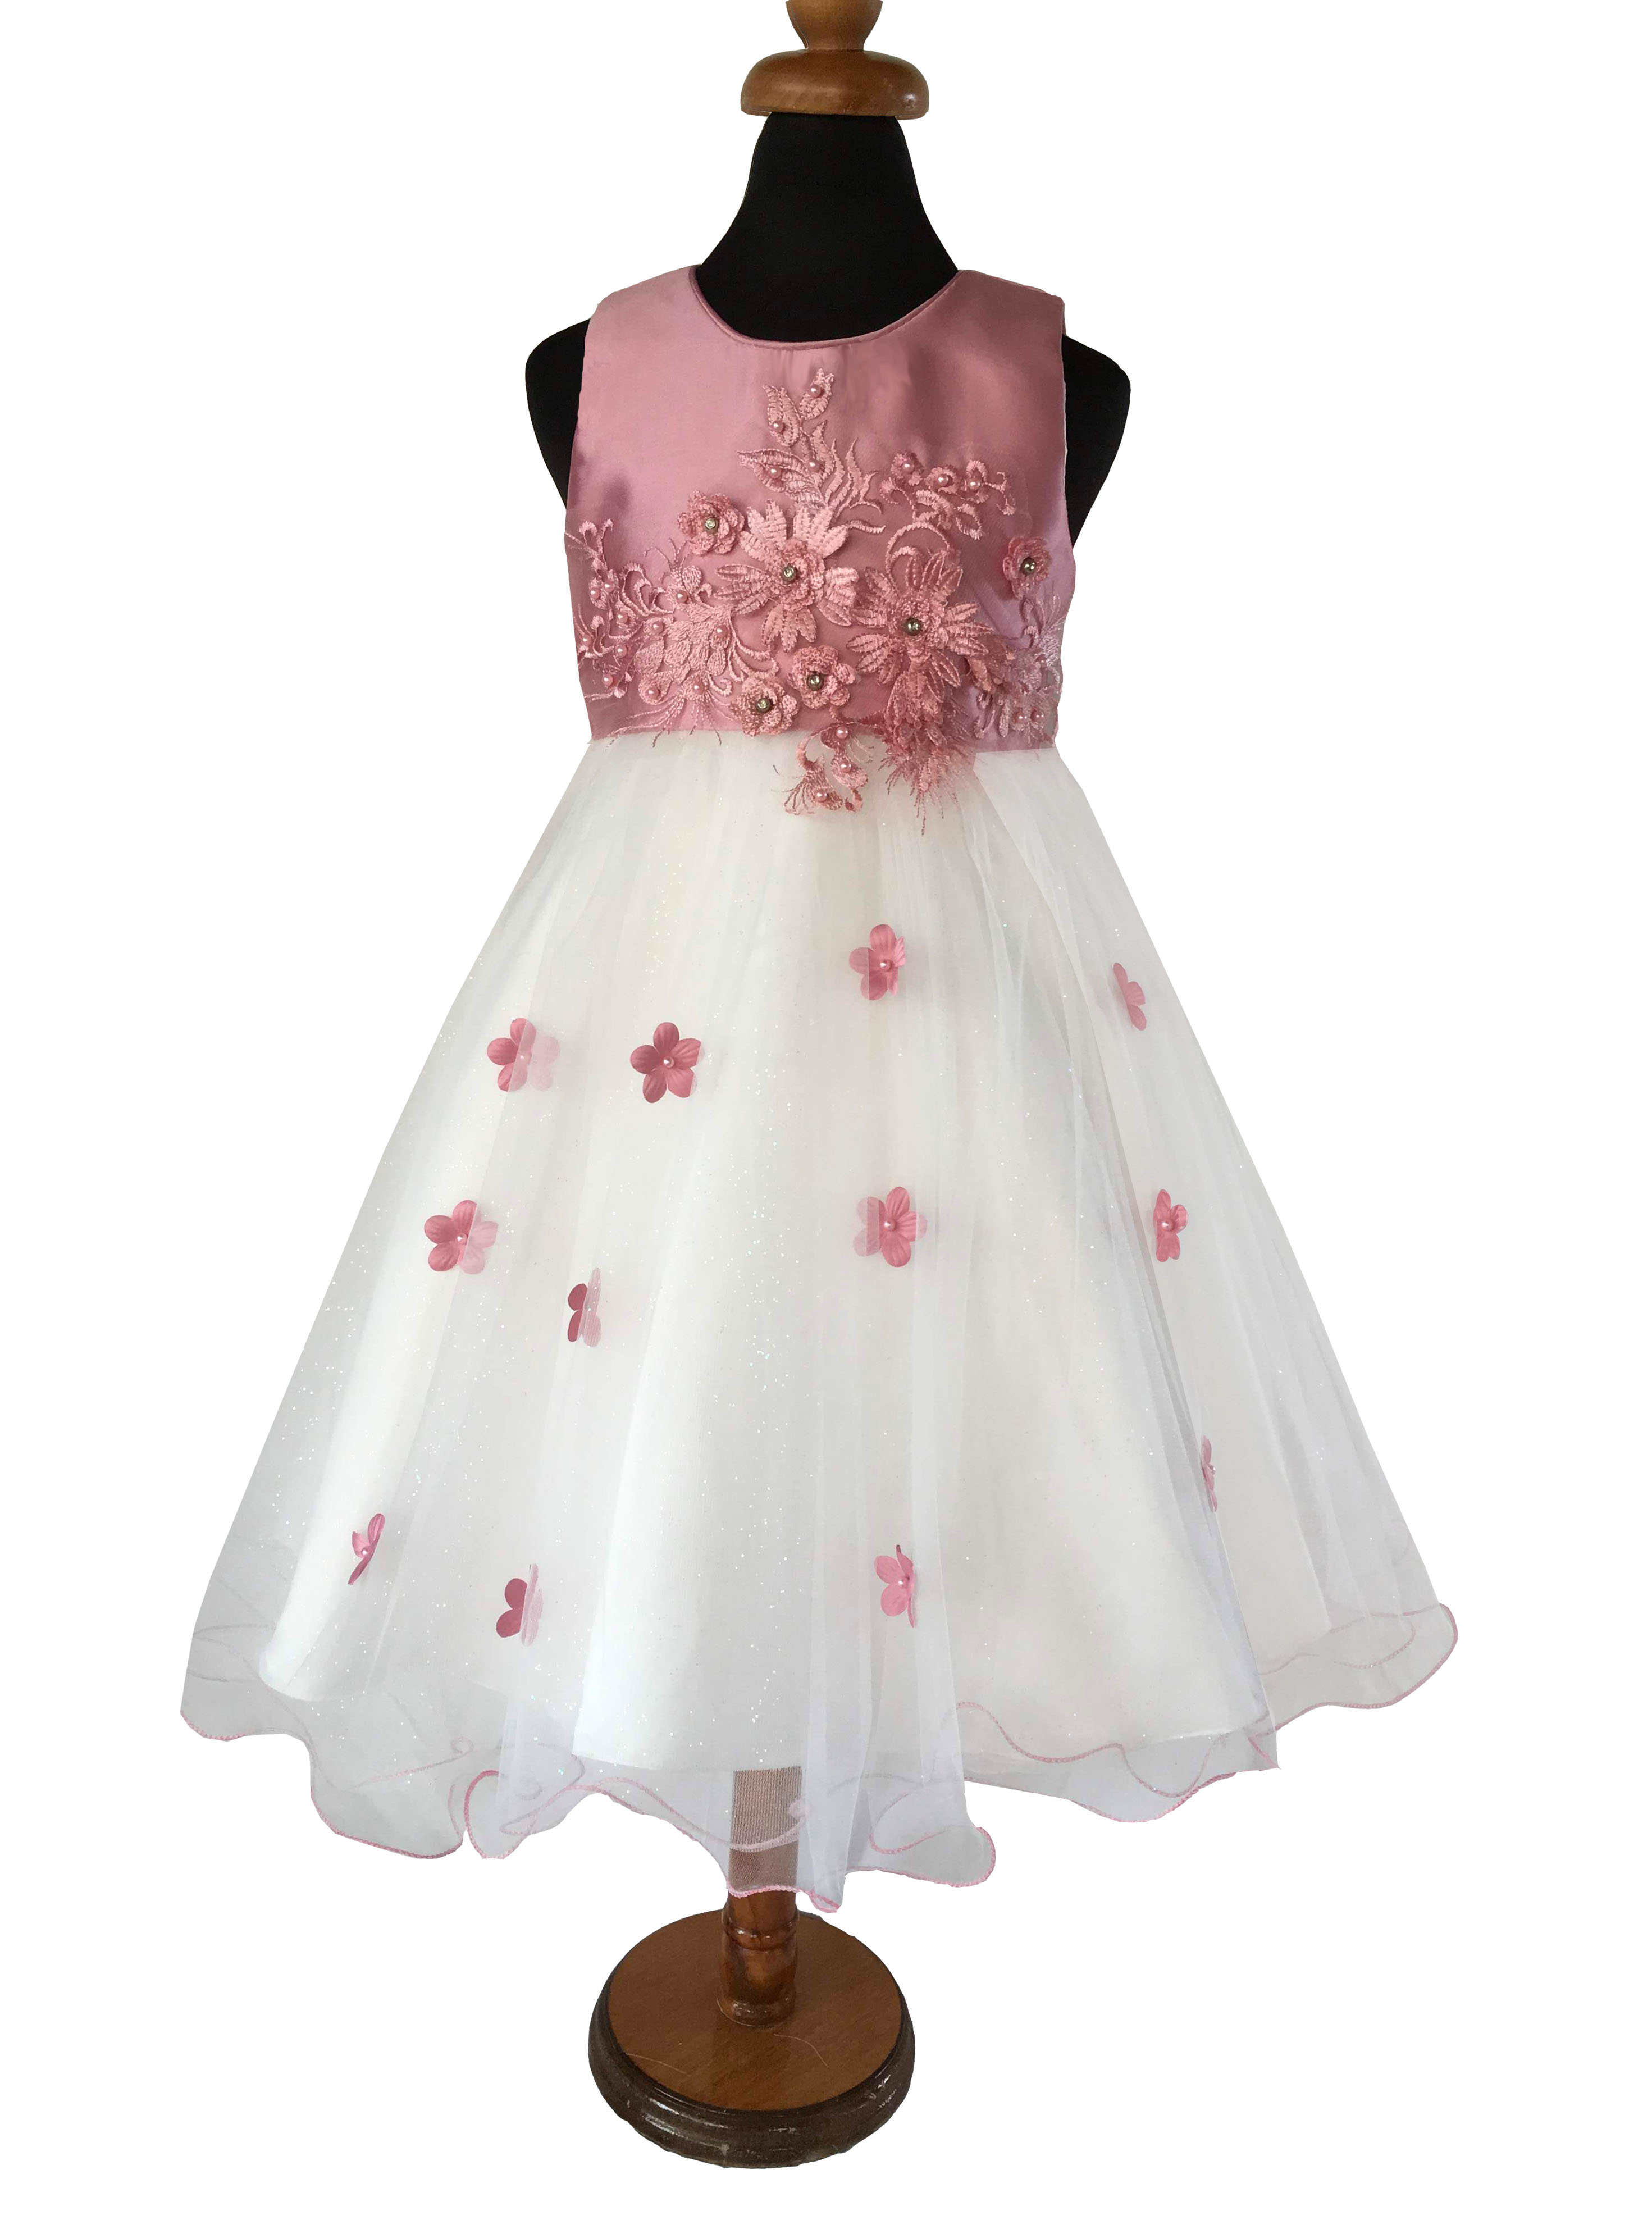 59d80ccf766 Παιδικό Φόρεμα σε Ροζ και Λευκό για Παρανυφάκι, Πάρτι